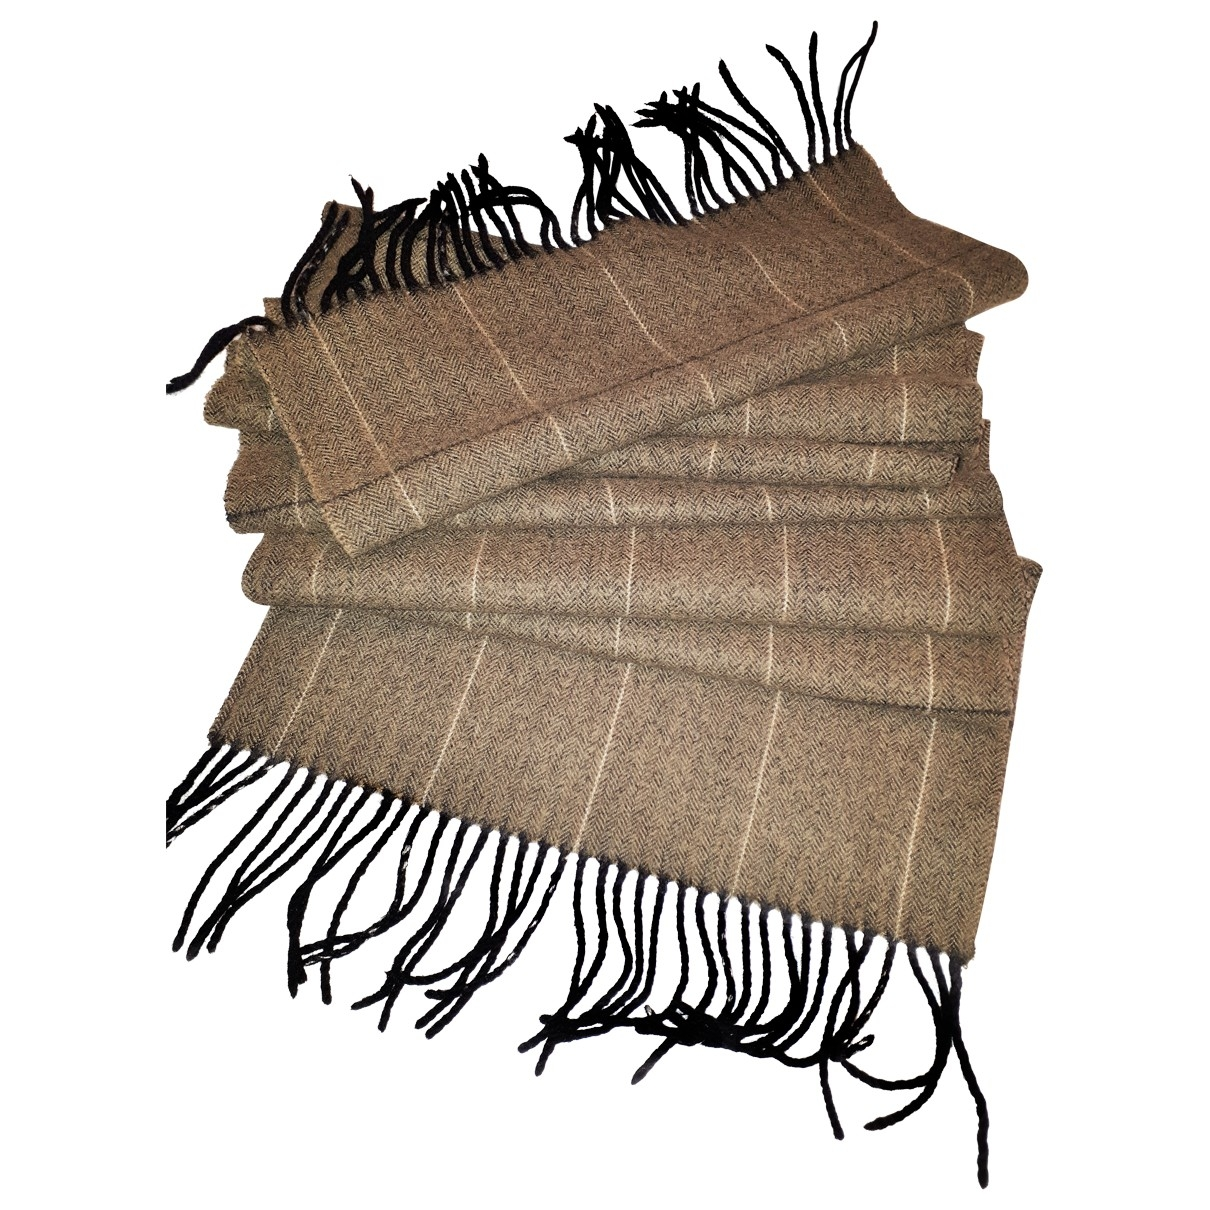 Pañuelo / bufanda de Lana Altea